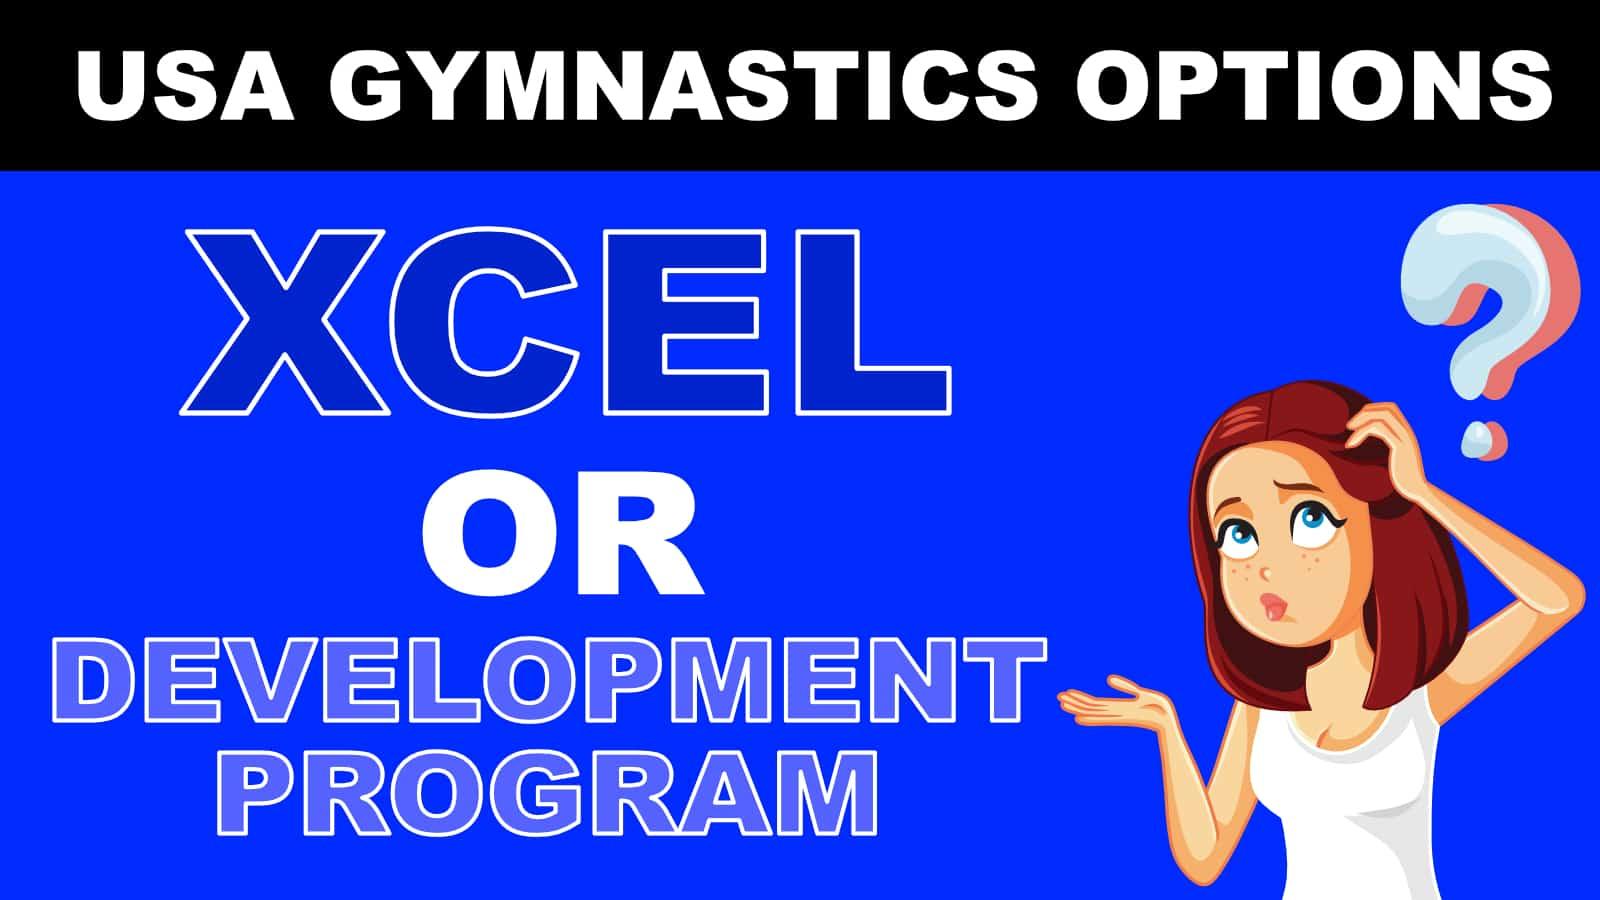 USA Gymnastics - Xcel or Development Program